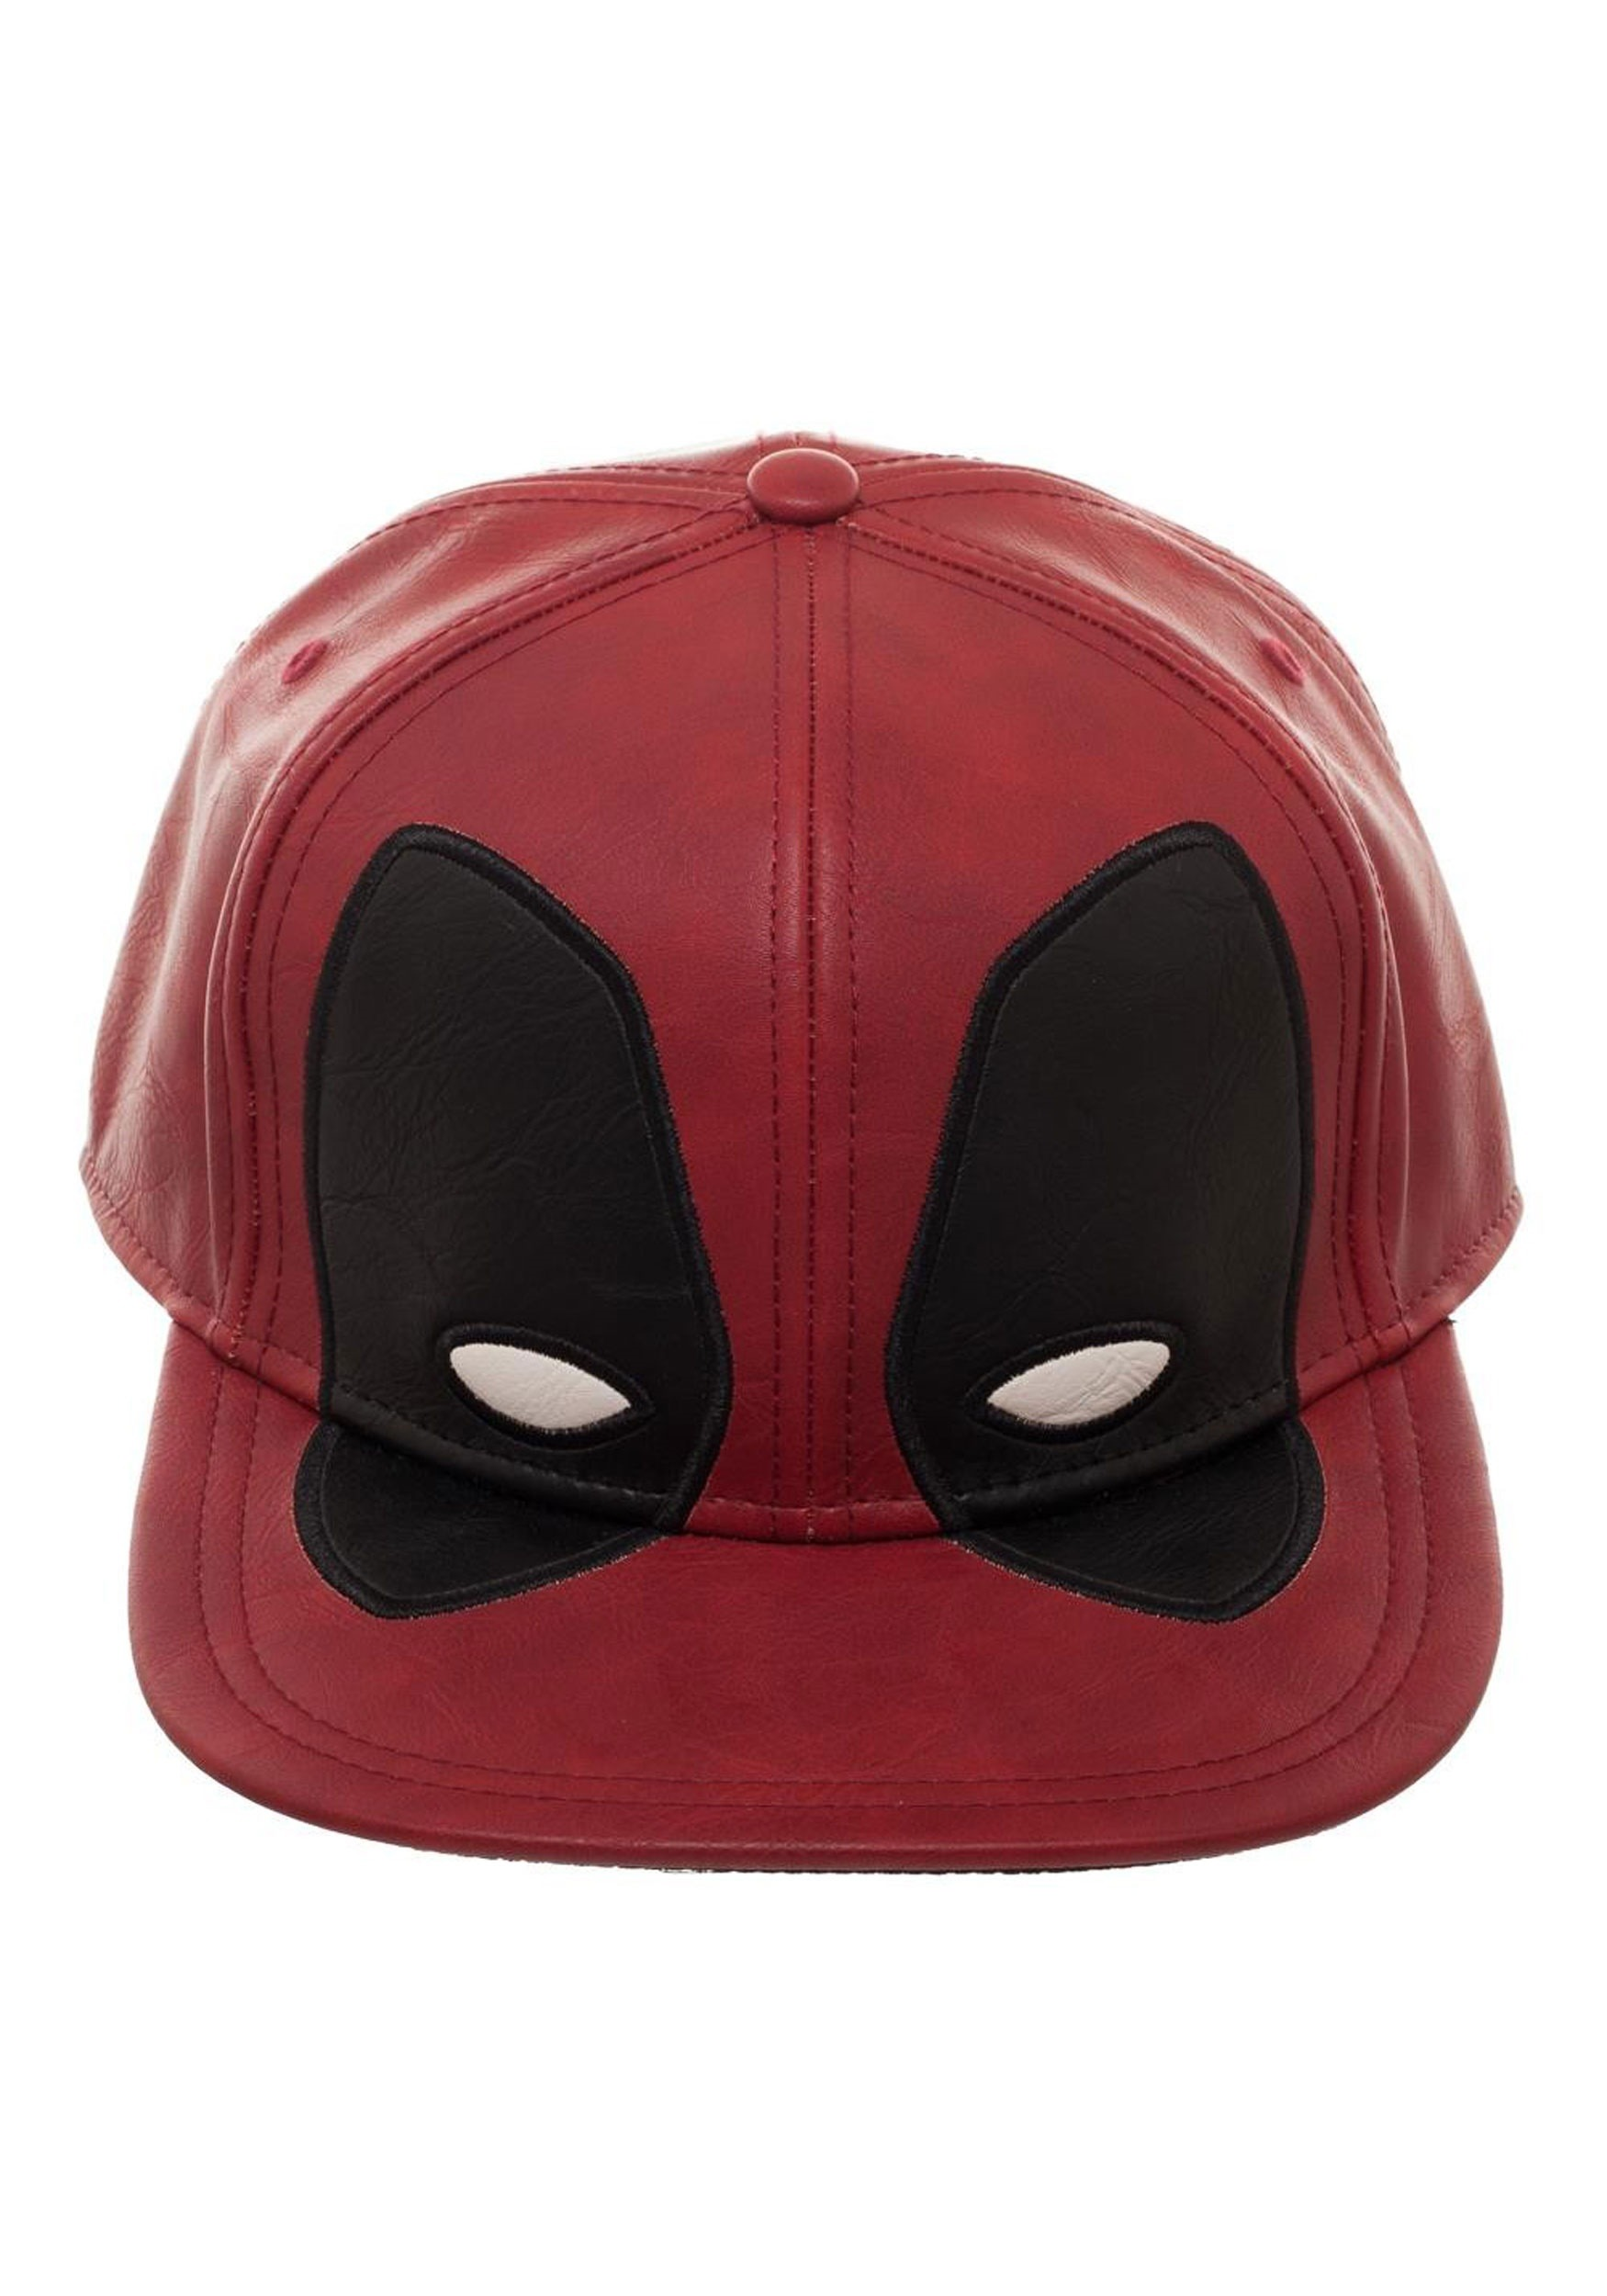 13a289fce154d Deadpool Big Face Distressed PU Snapback Hat